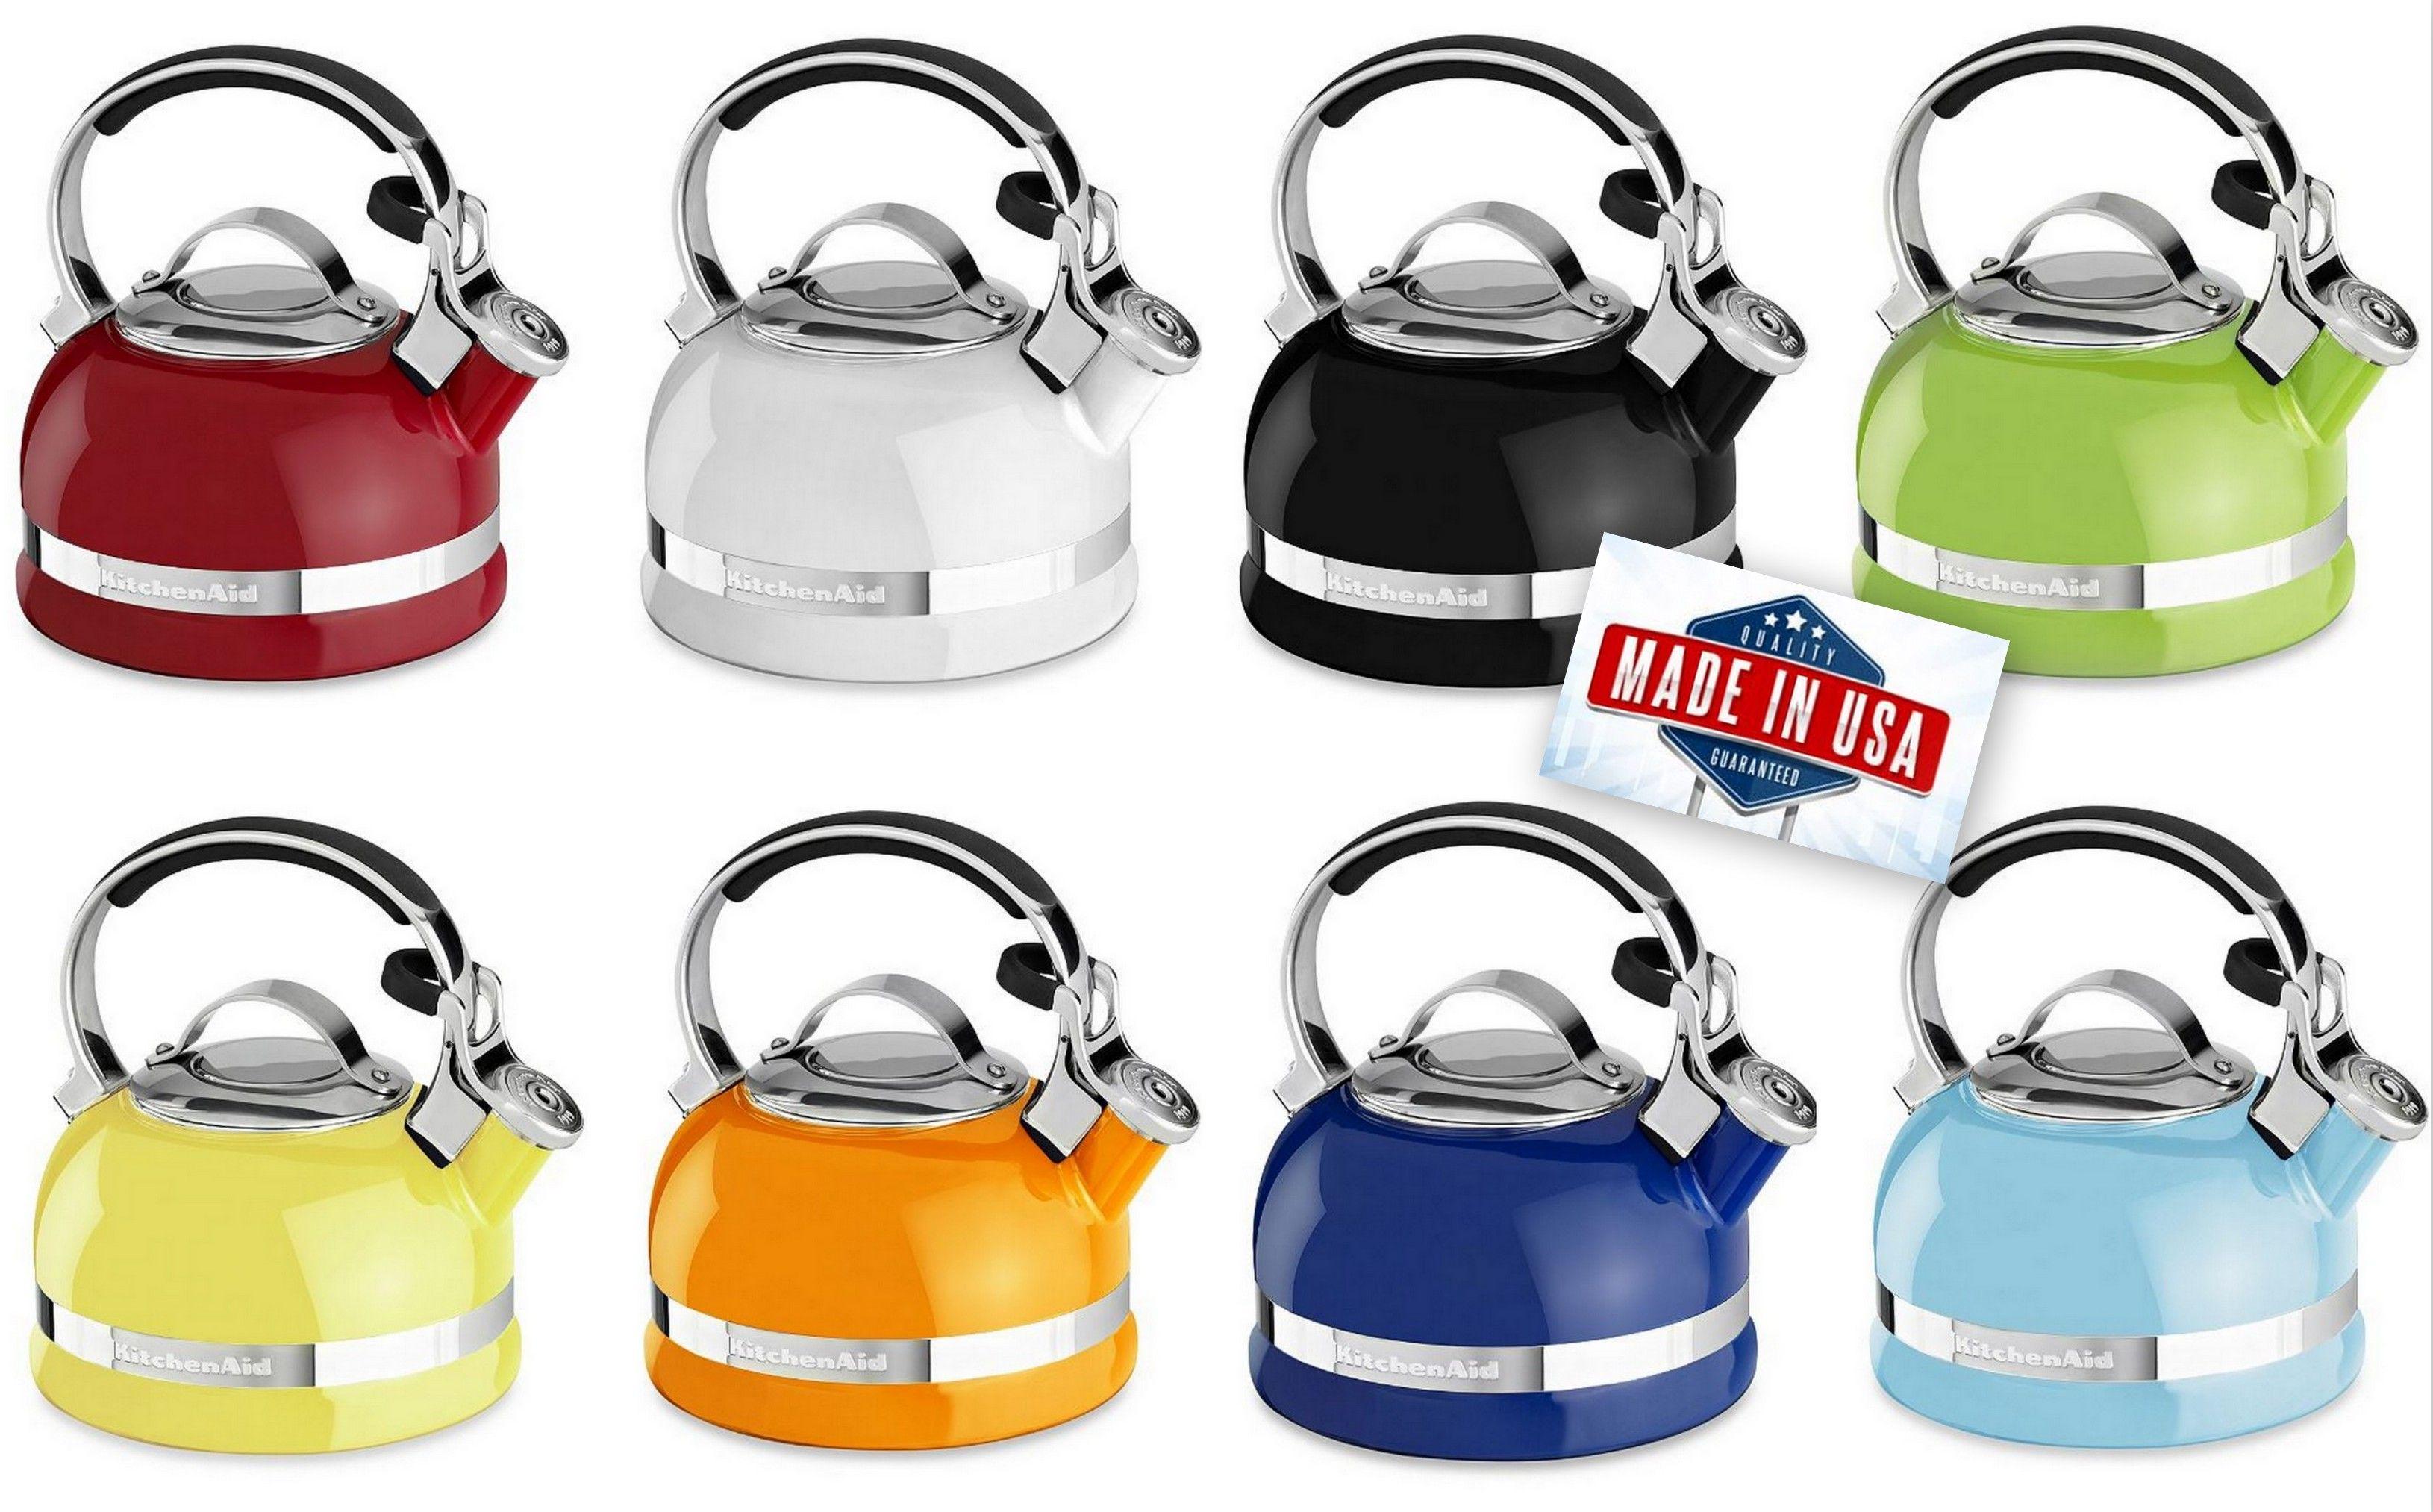 New Kitchenaid Tea Kettle 2 Quart Nowy Czajnik 1 9 Litra Http Madeinusa